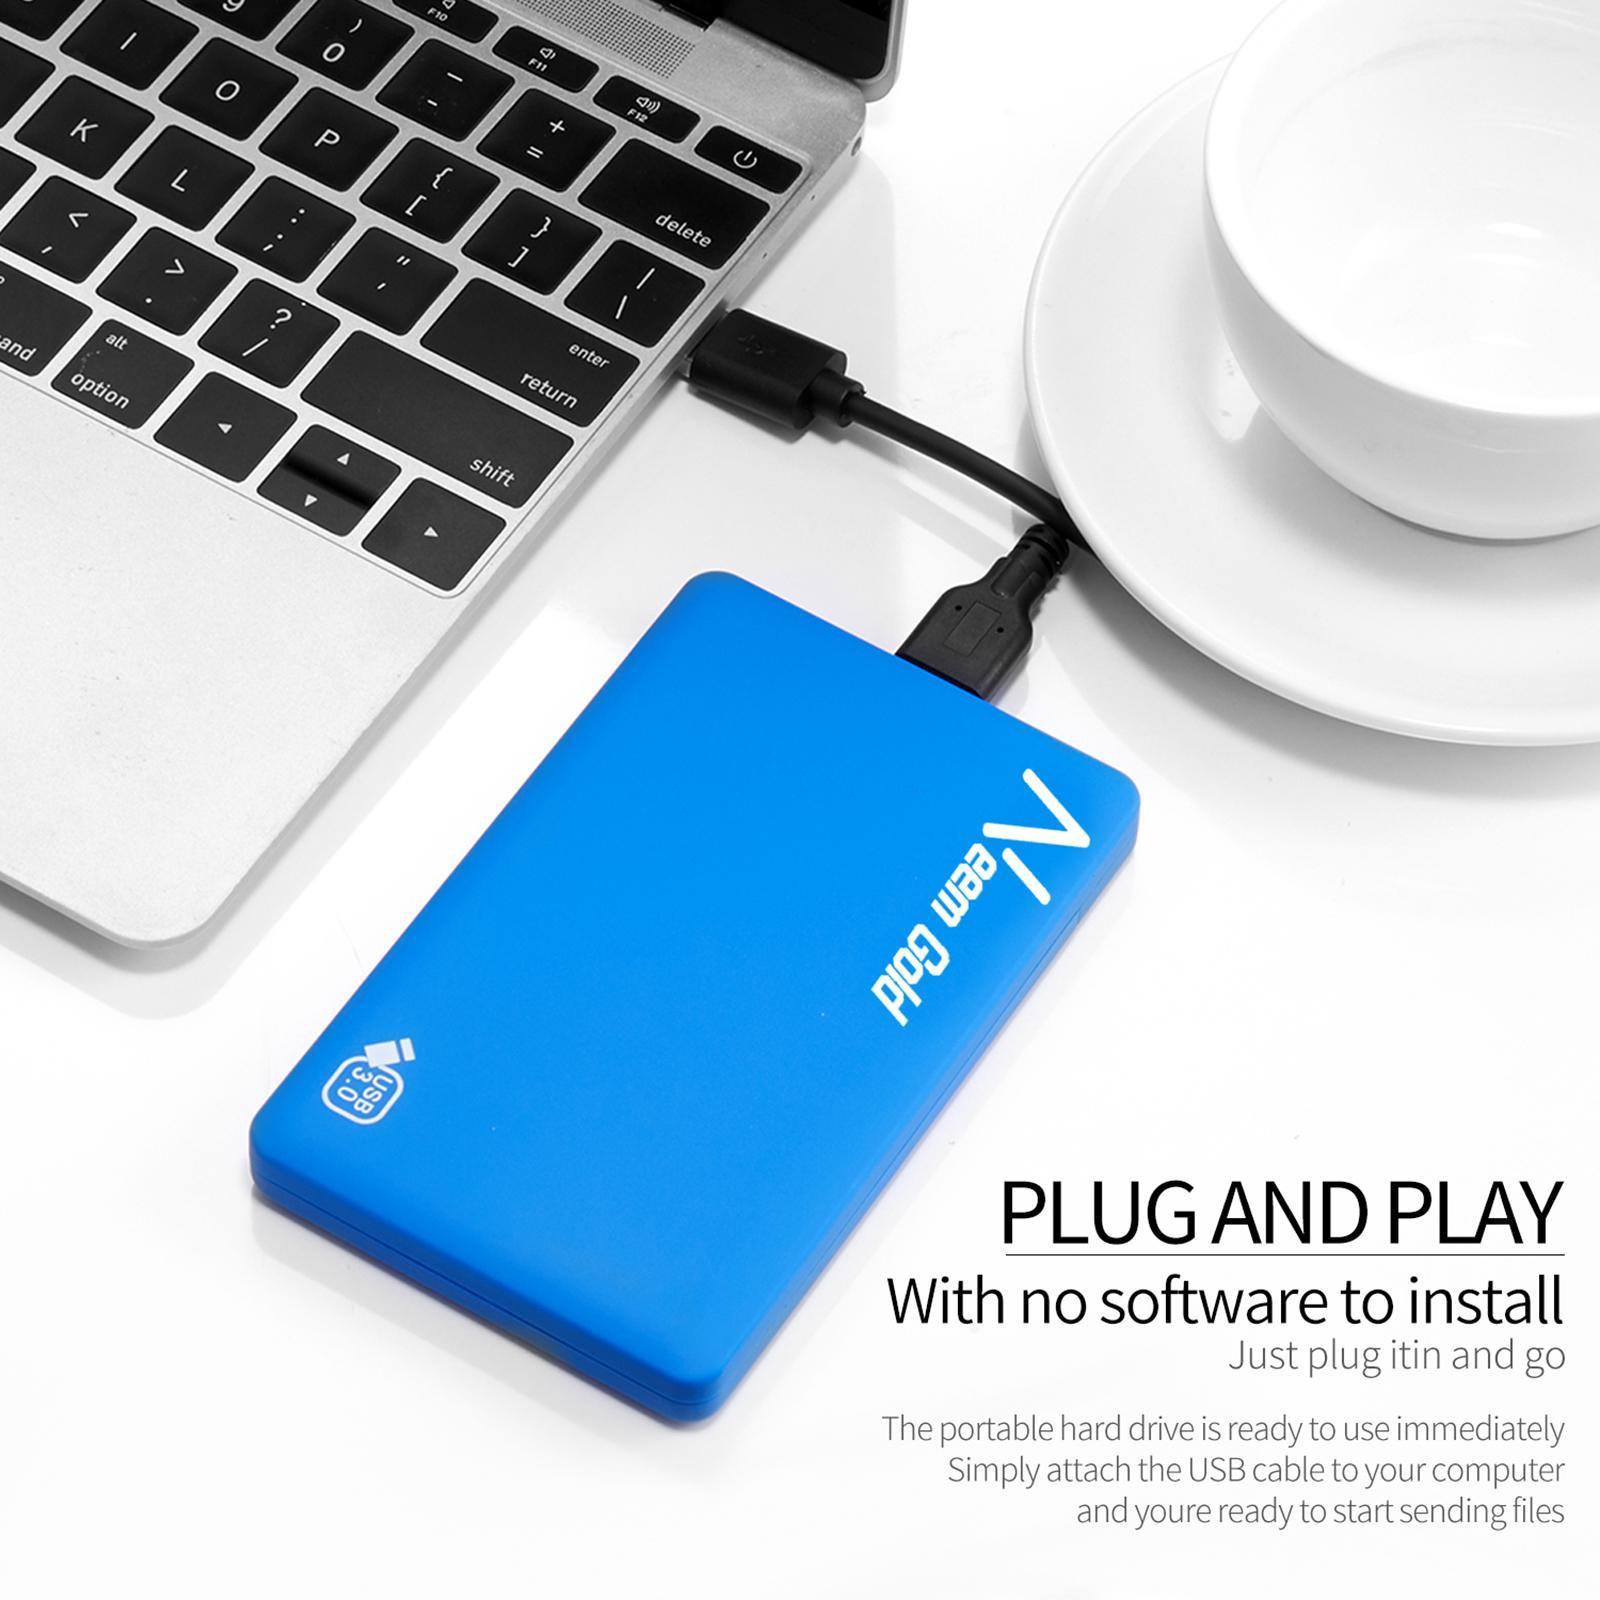 miniature 27 - ABS External Portable USB 3.0 Hard Drive Disk HDD for Desktop Laptop New